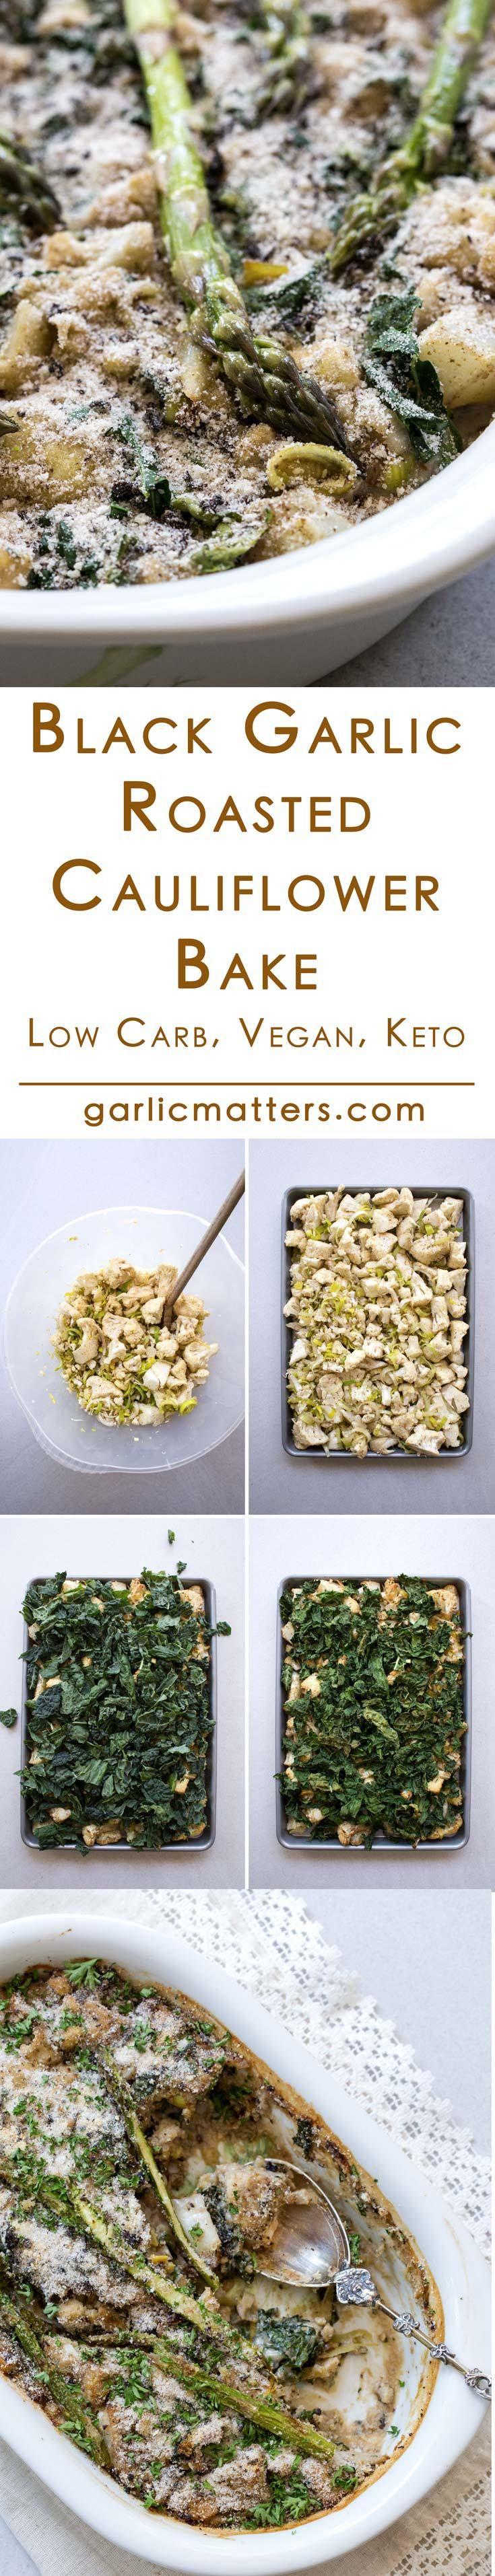 Black garlic roasted cauliflower bake